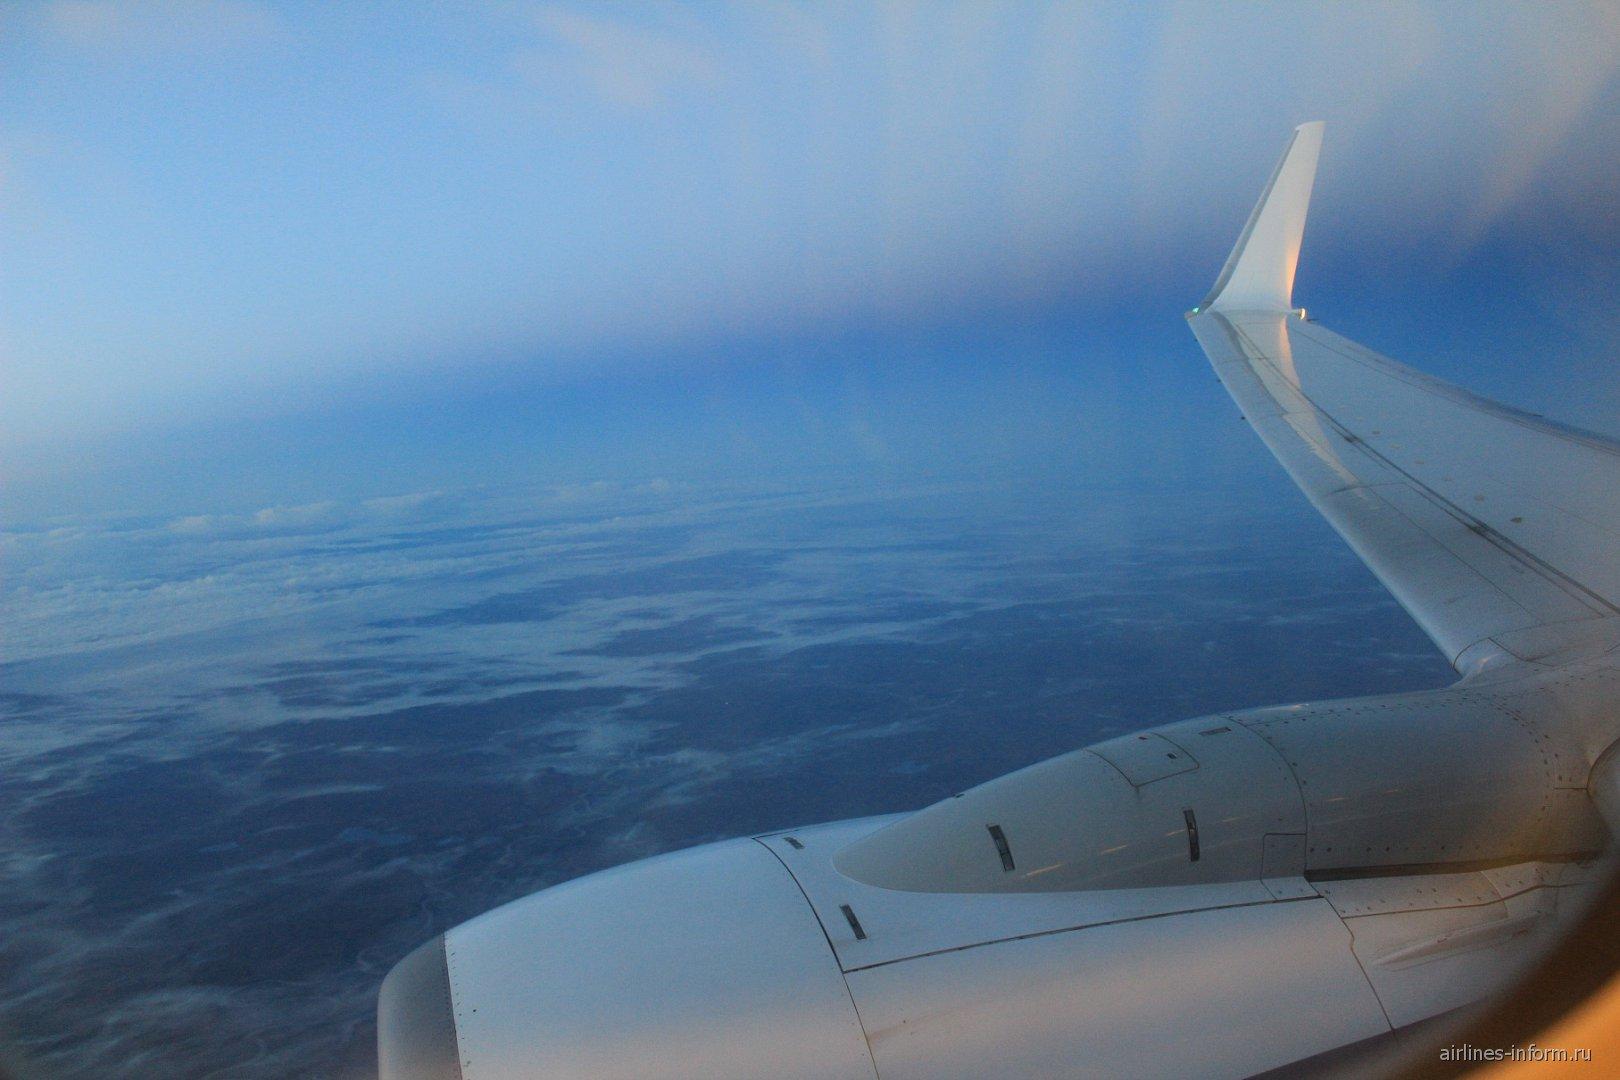 Рейс Москва-Норильск авиакомпании Нордстар